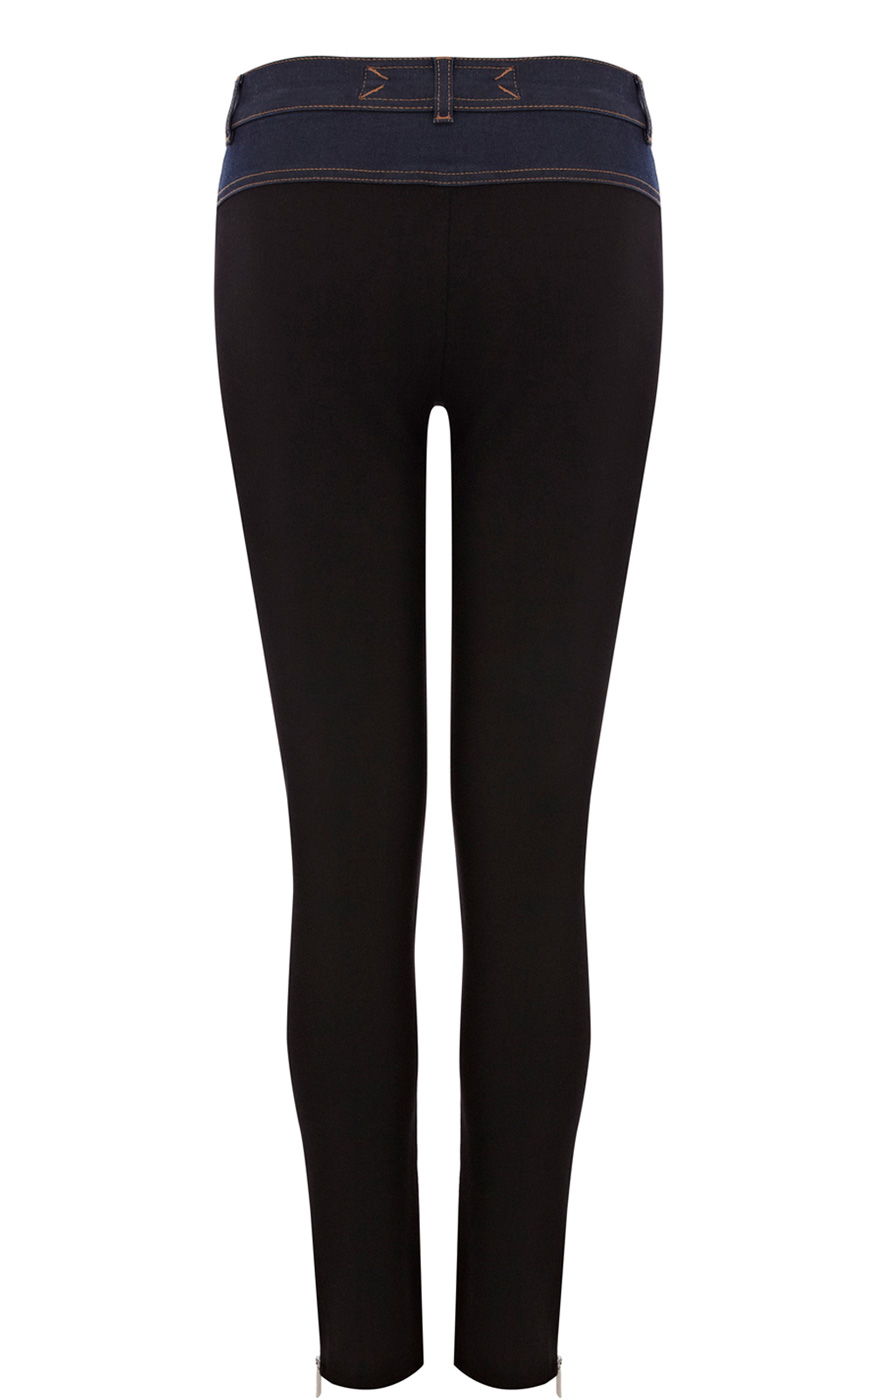 Karen Millen Dark Denim Jeans in Black (Blue)